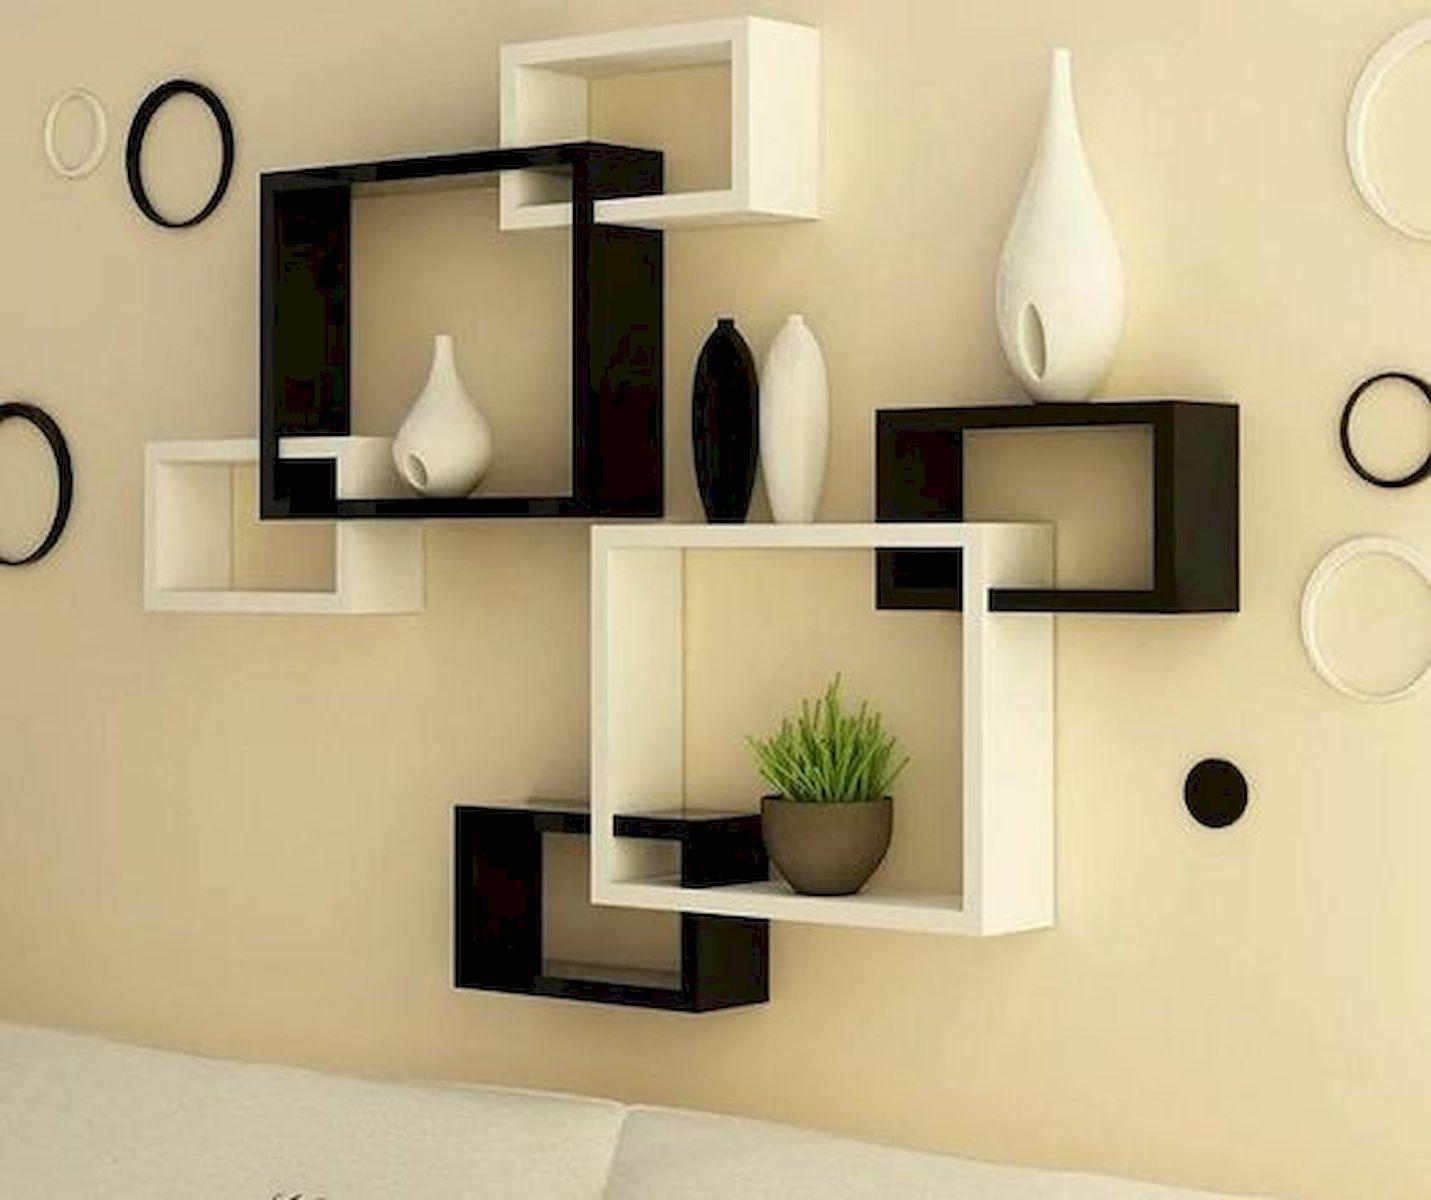 60 Creative Diy Projects Furniture Living Room Table Design Ideas Wall Shelves Design Decor Room Decor